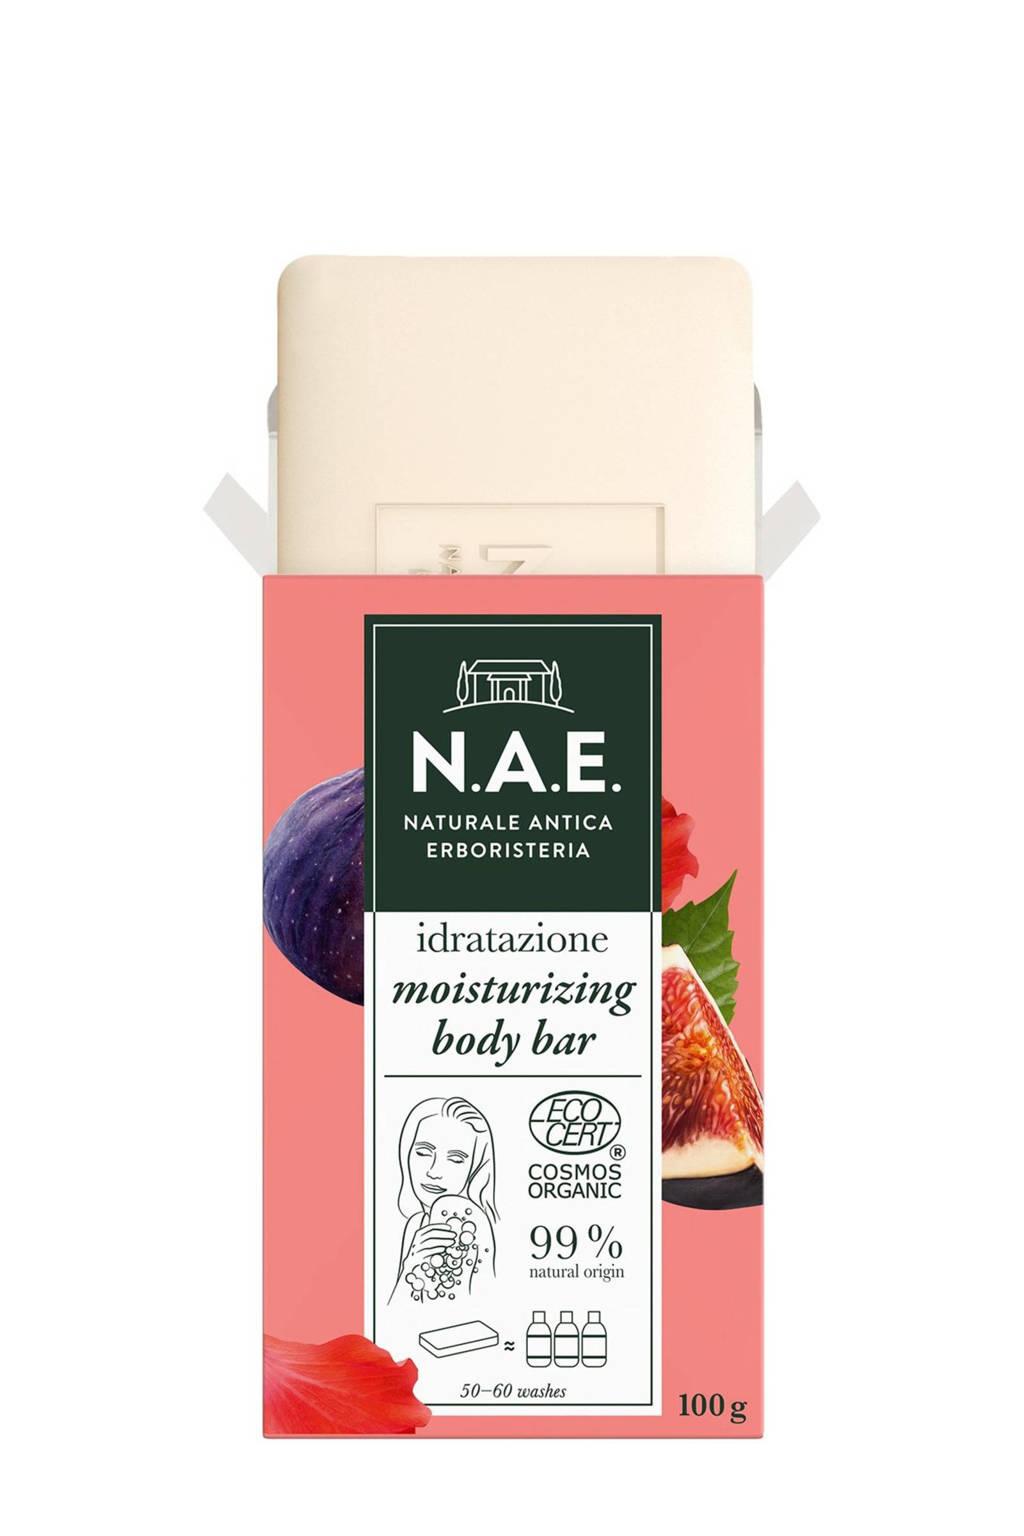 N.A.E. Idratazione Moisturizing body bar - 100 gr